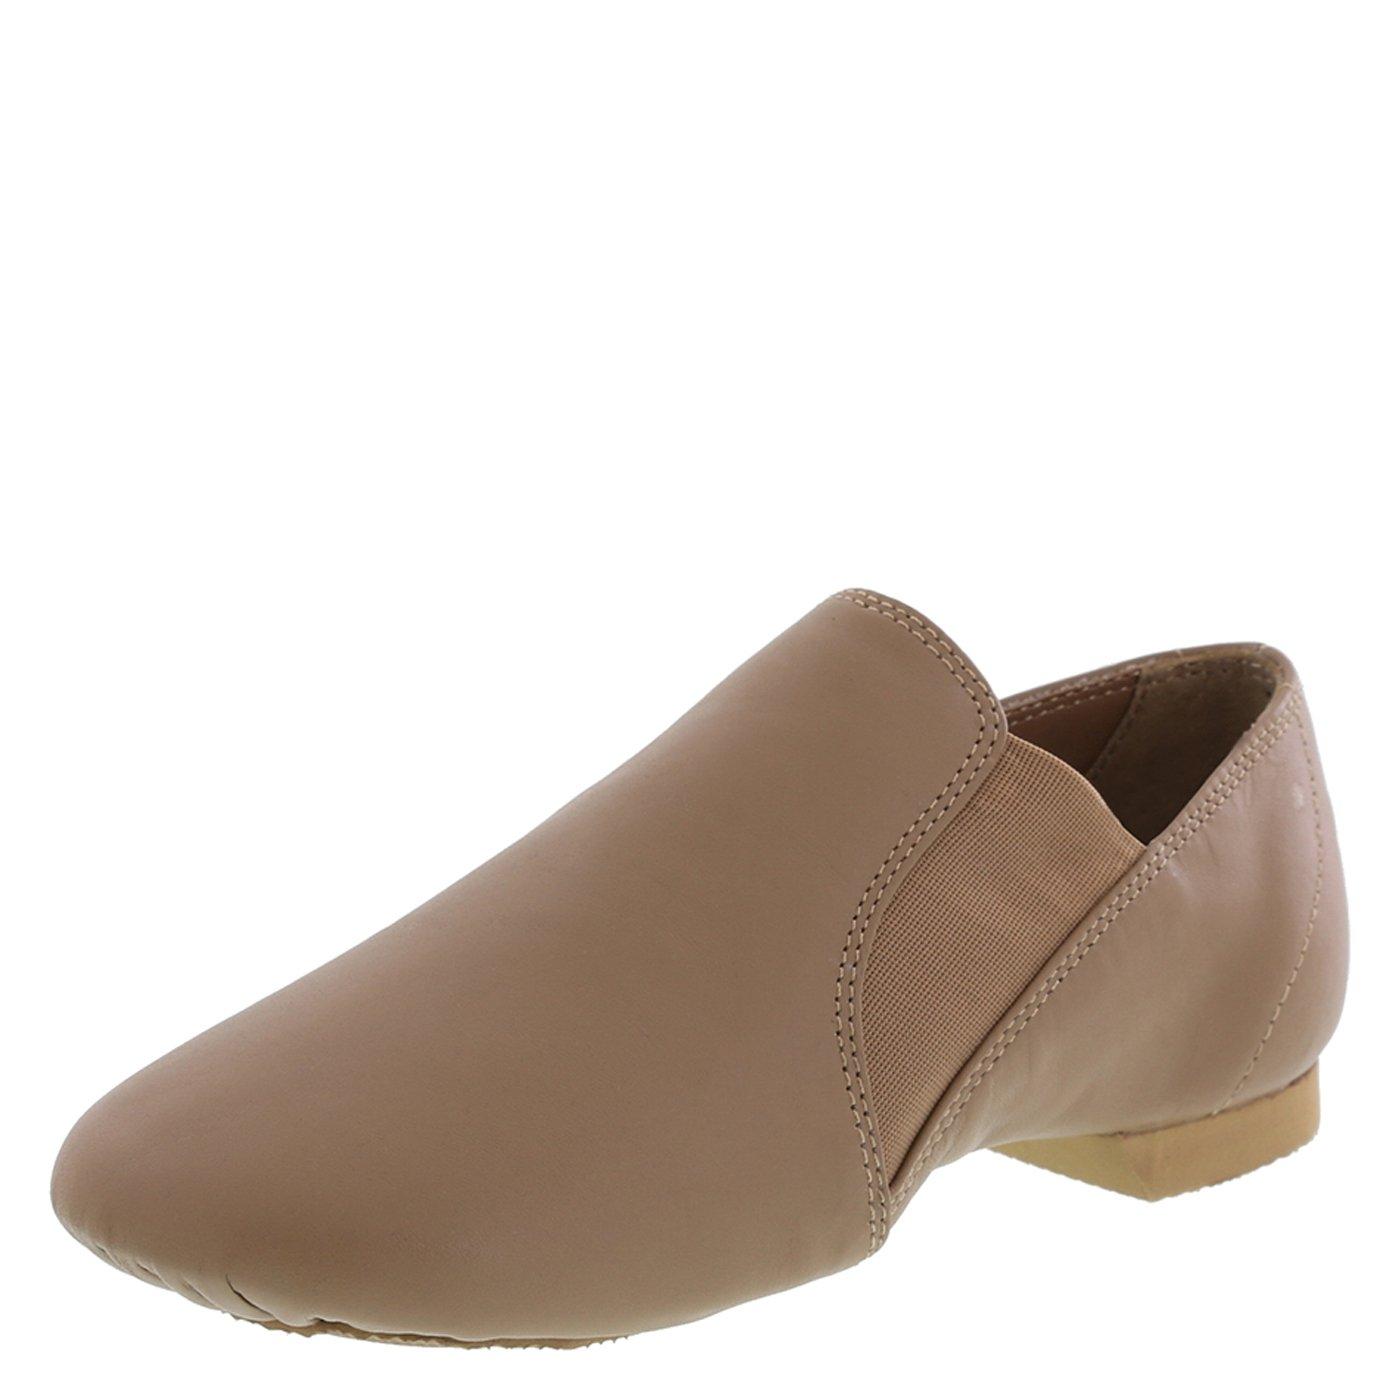 American Ballet Theatre for Spotlights Women's Twin Gore Jazz US|Tan Shoe B00ZGQBLCE 8.5 B(M) US|Tan Jazz e08e3c